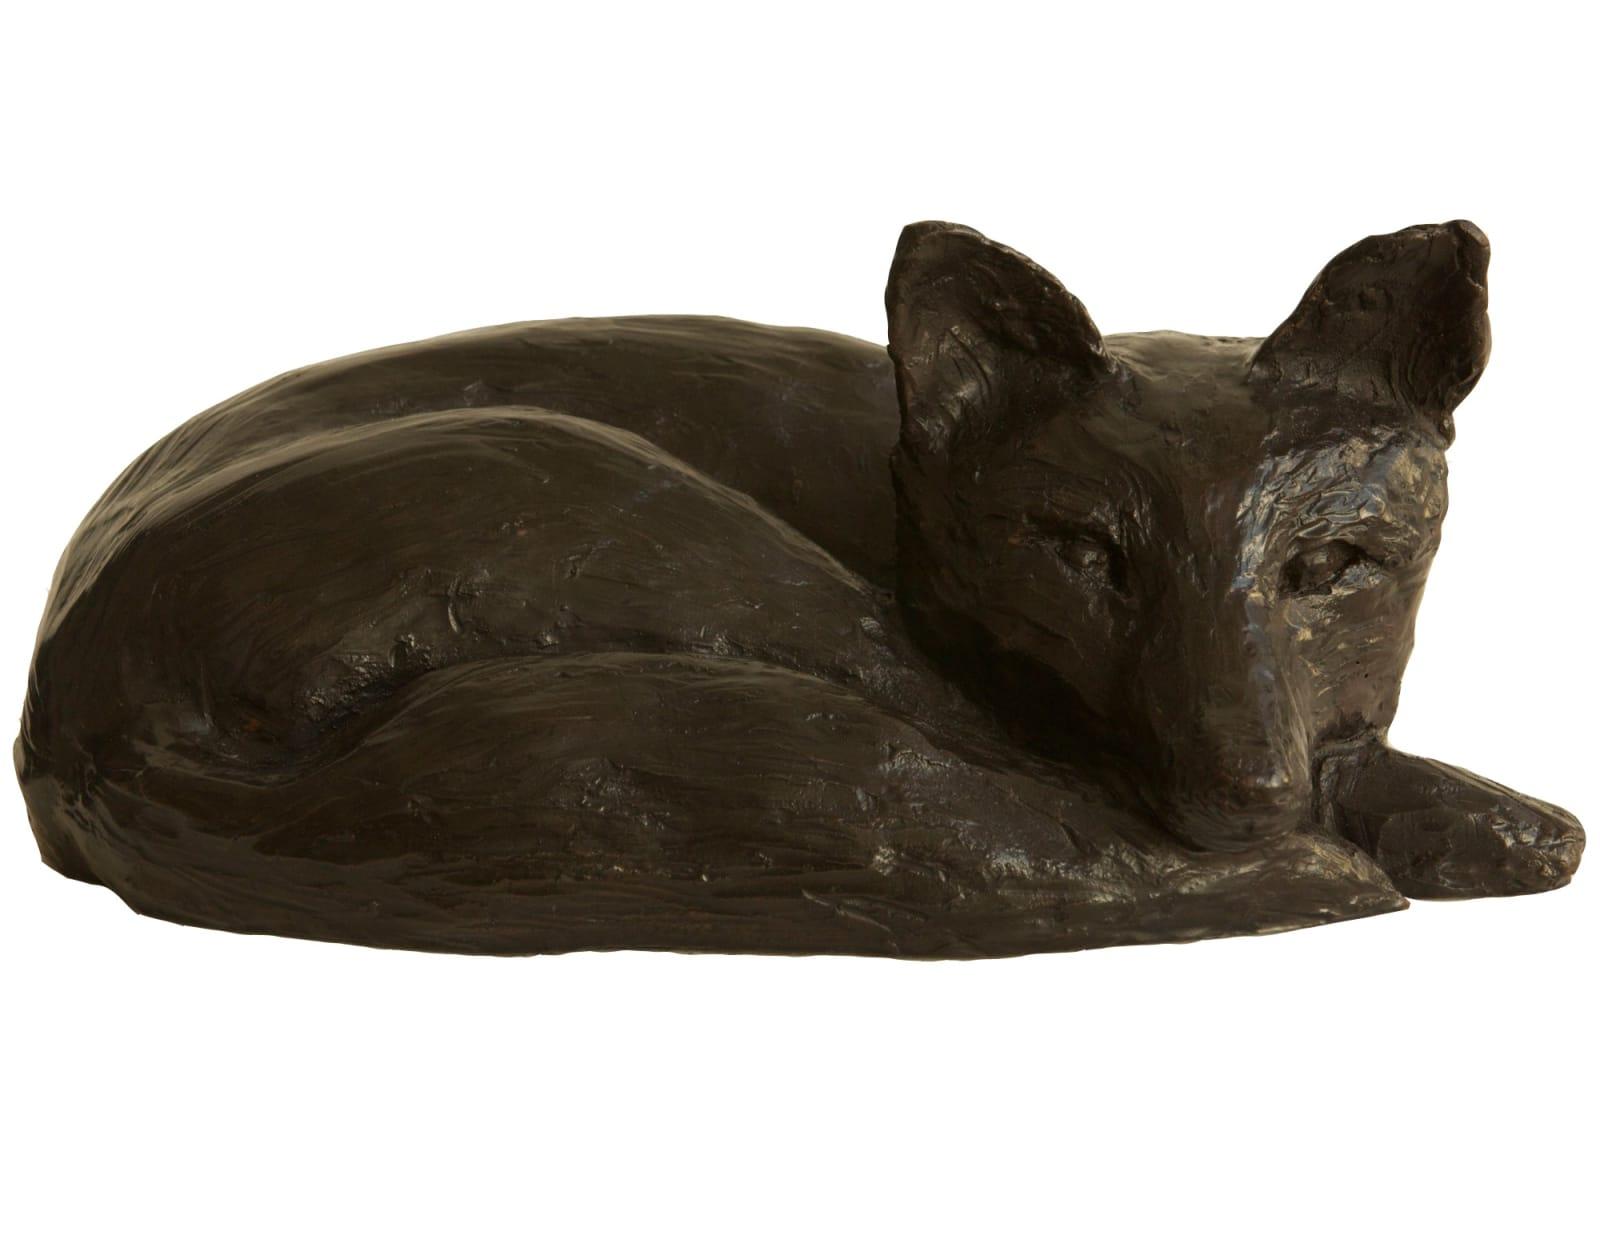 Caroline D'Andlau Hombourg, Renard II (Sleeping Fox) 1/8